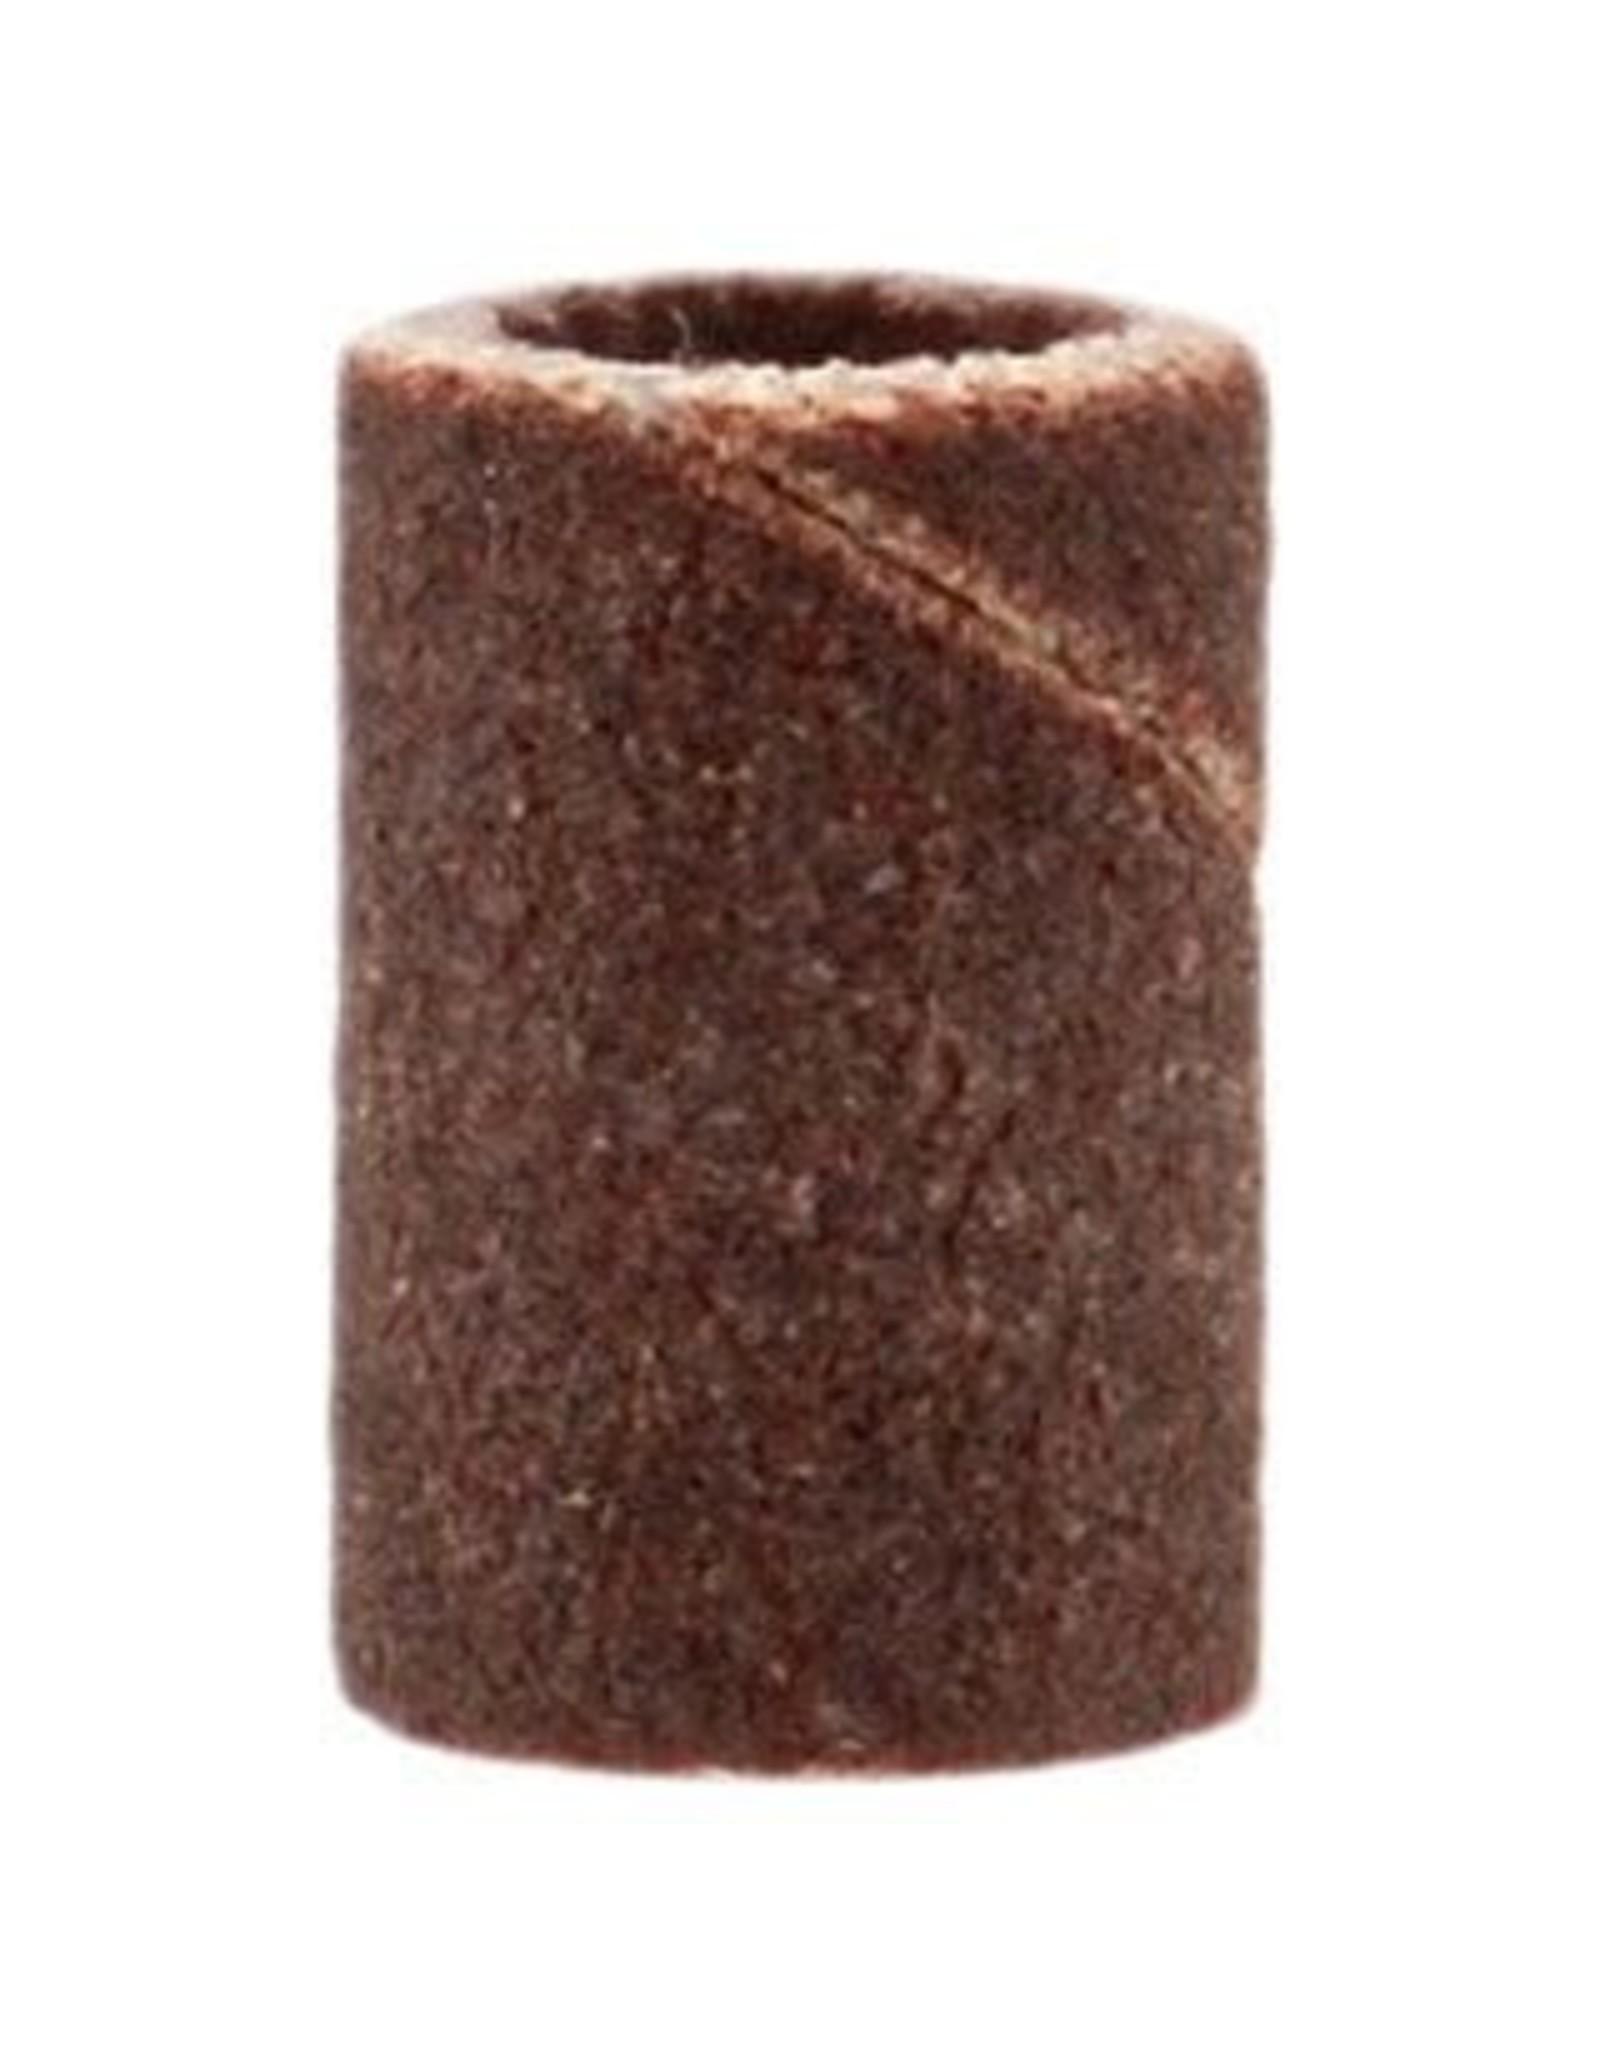 Conair Conair Pro Nail Grinder Replacement Sanding Bands